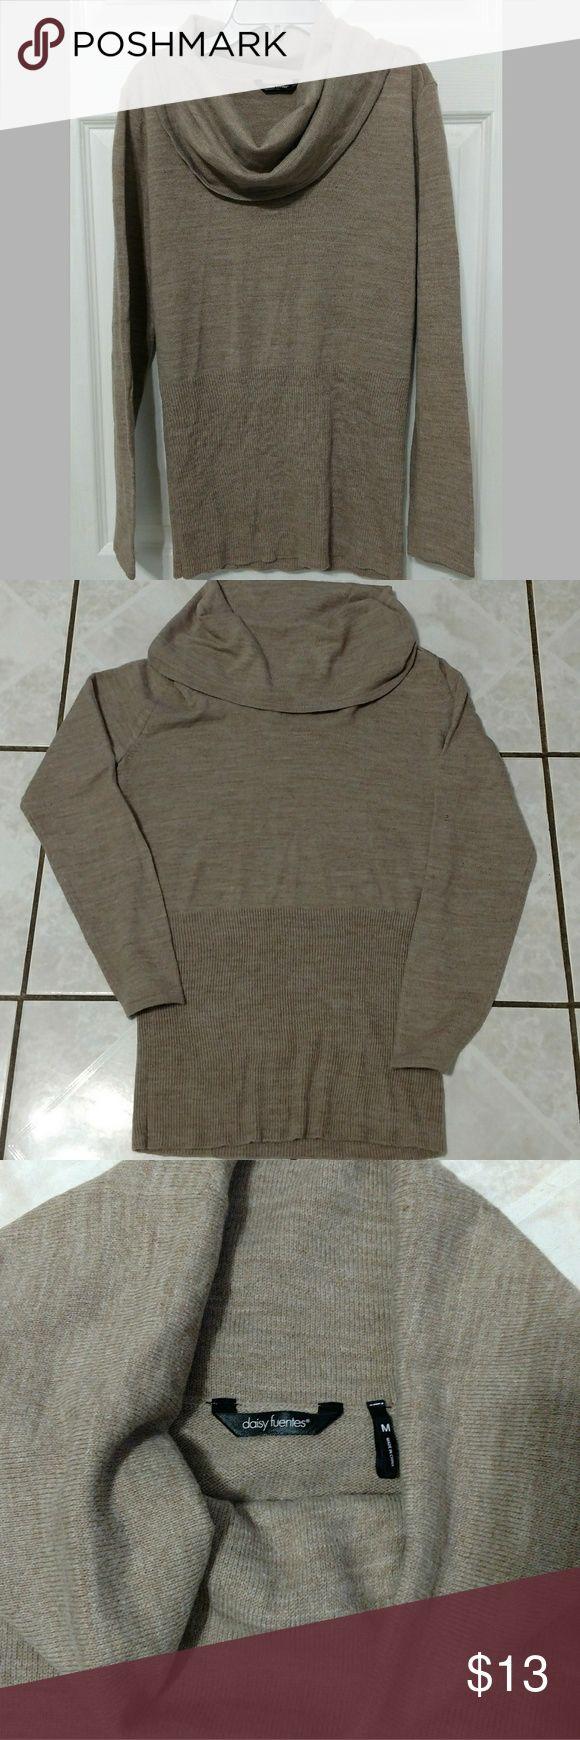 Daisy fuentes cowl sweater Daisy Fuentes tan cowl sweater Daisy Fuentes Sweaters Cowl & Turtlenecks